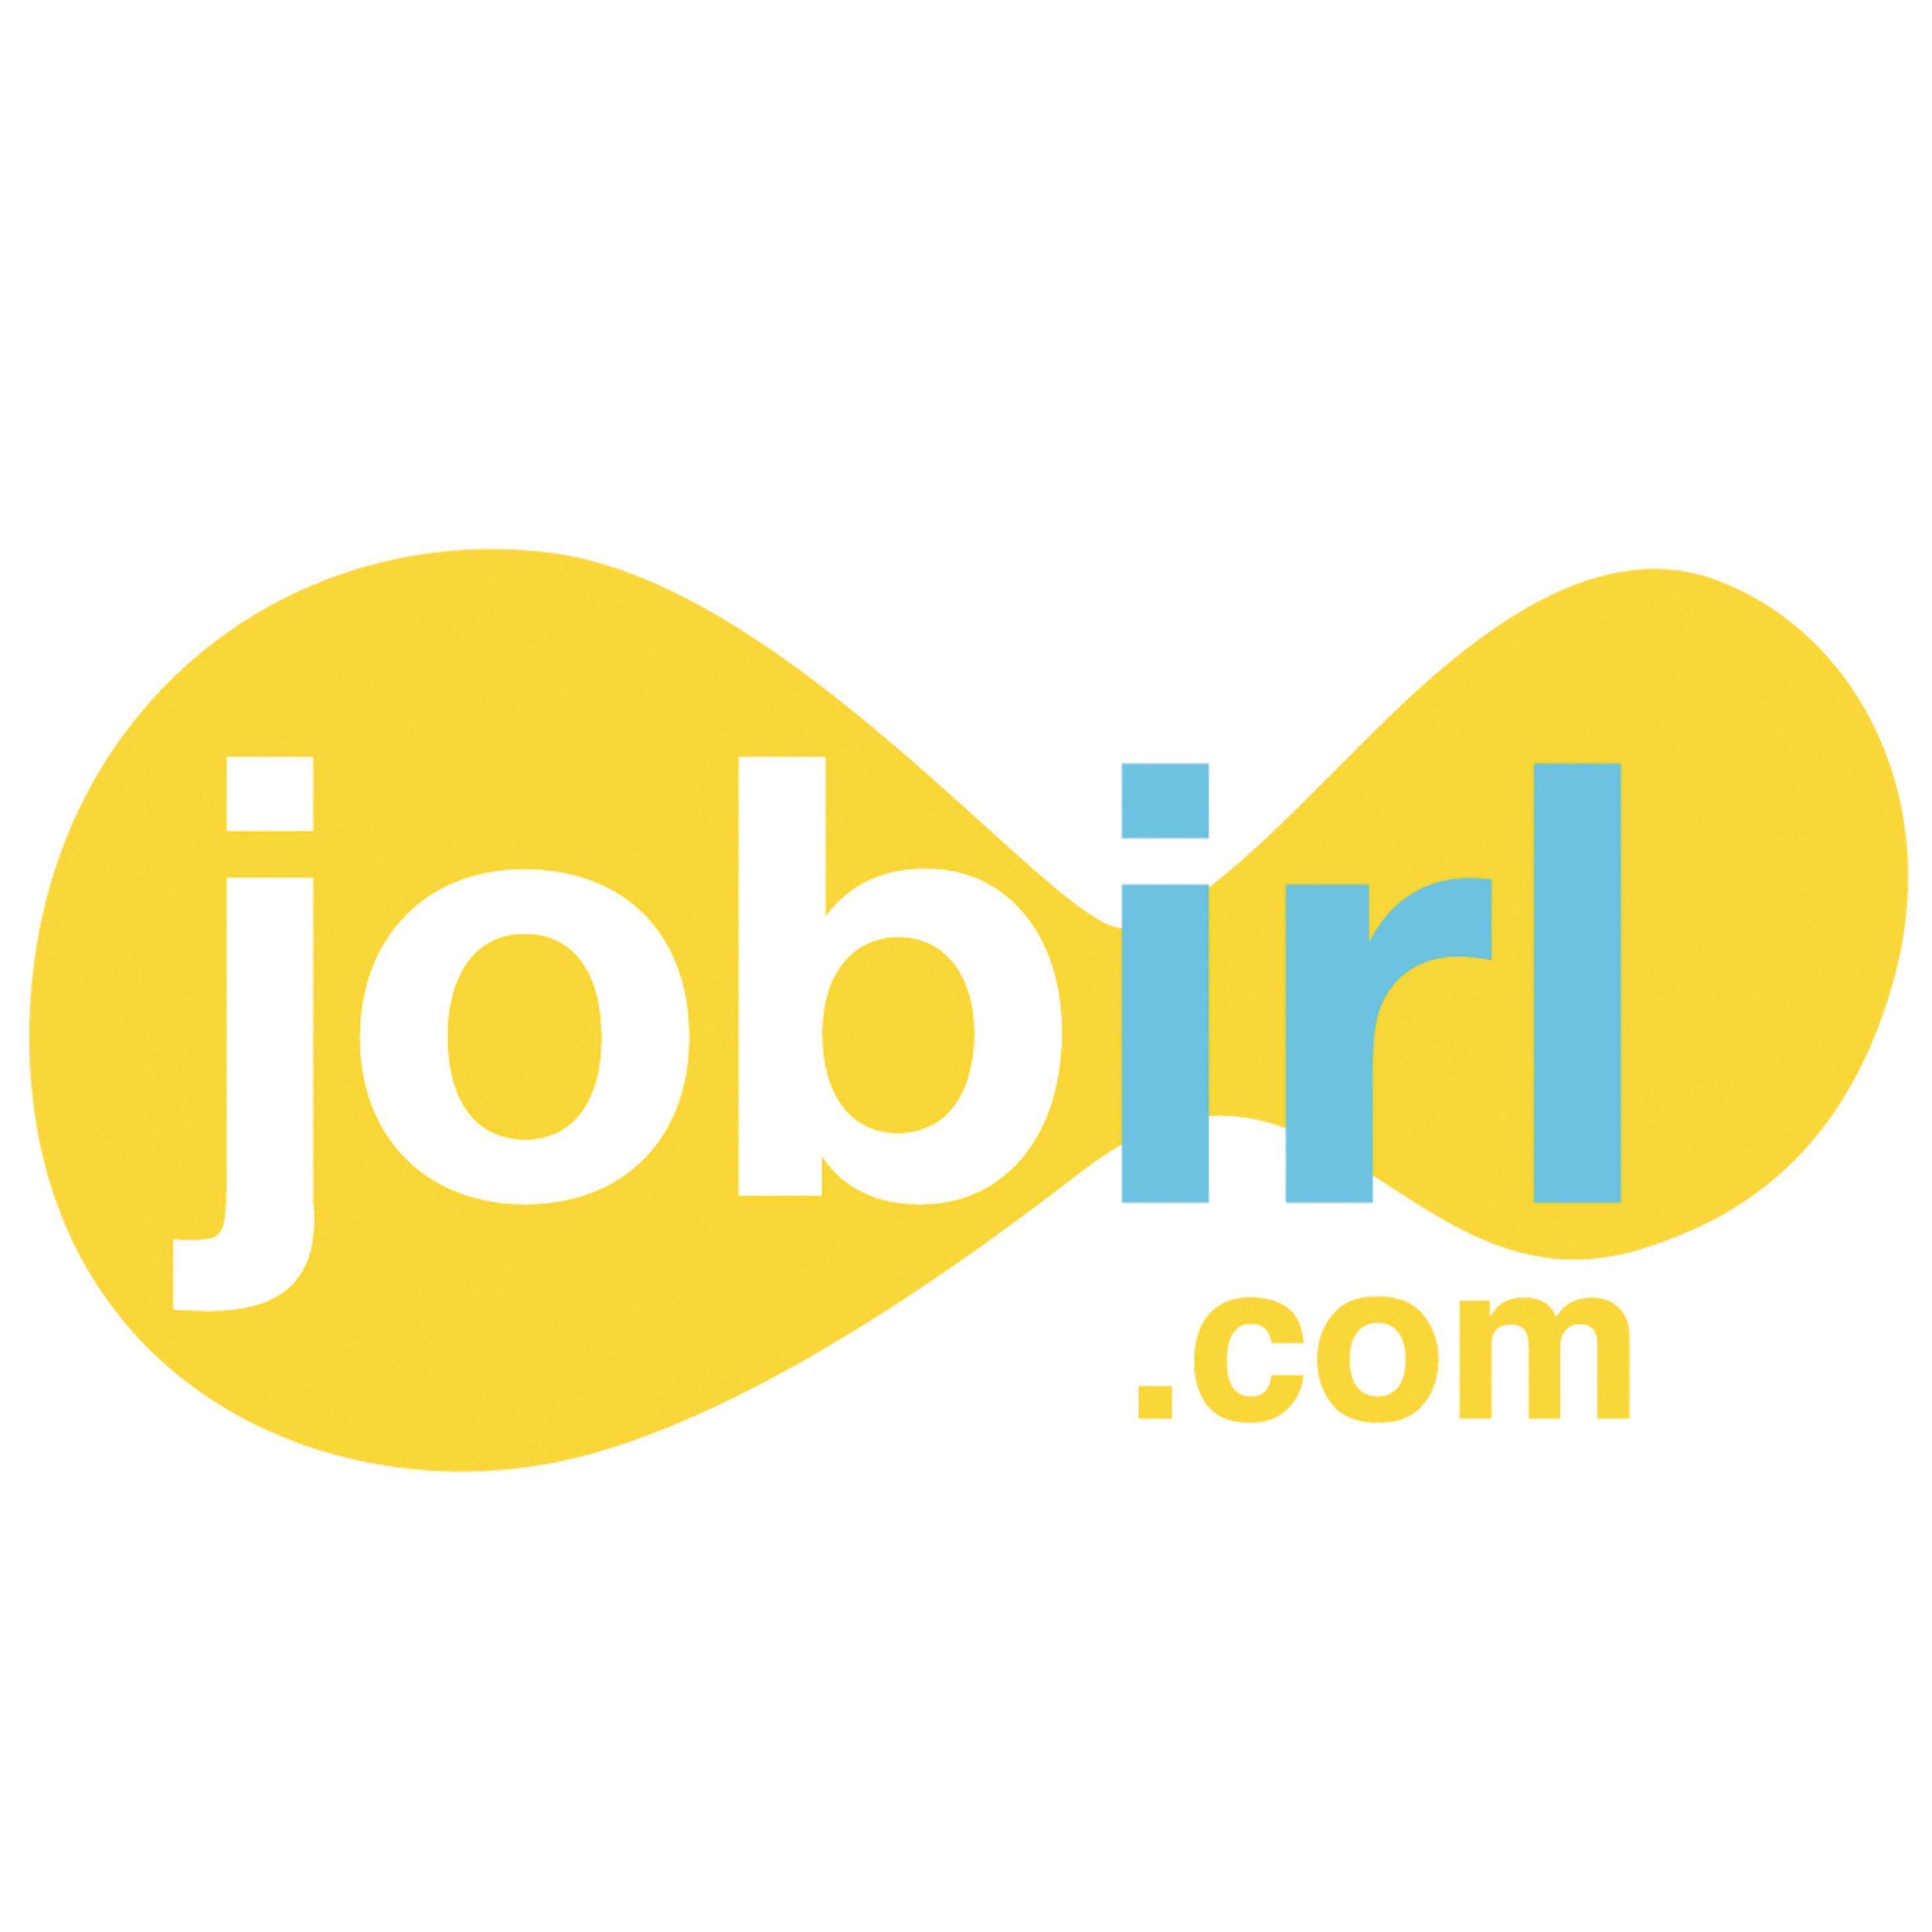 Association - JobIRL